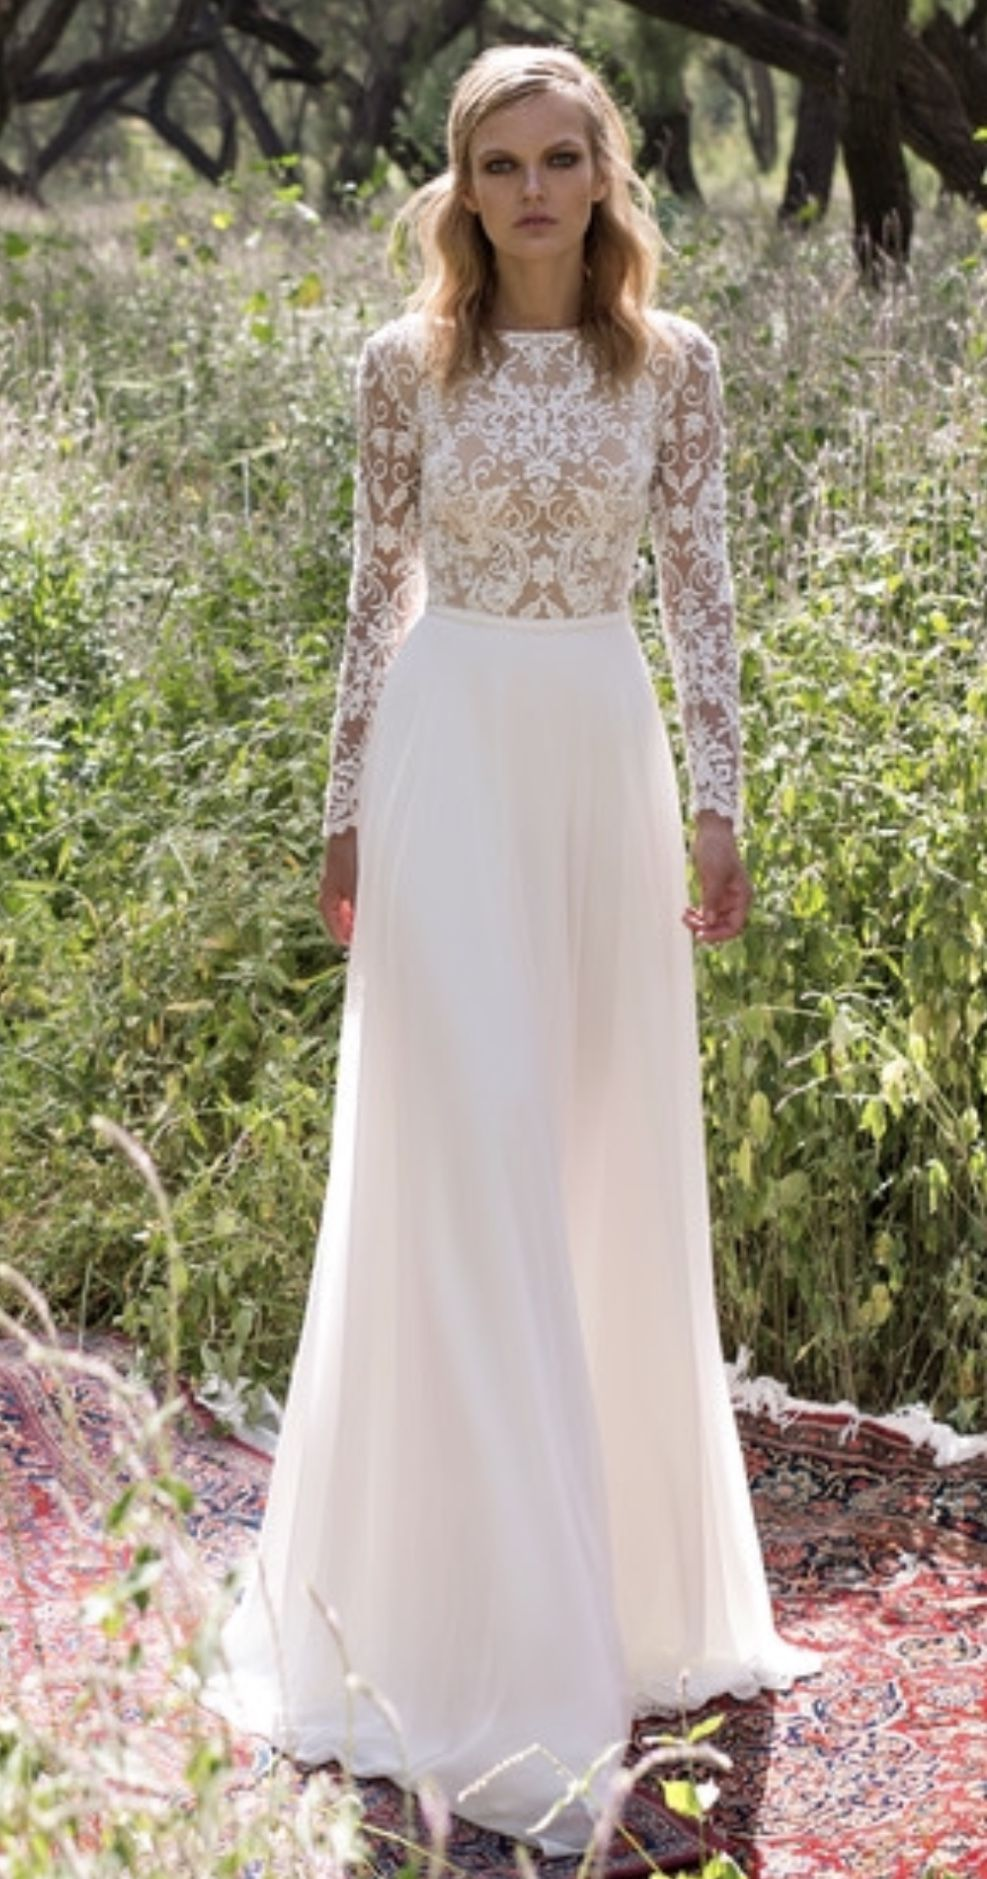 Limor Rosen Wedding Dress Long Sleeve Wedding Dresses Lace Wedding Dresses